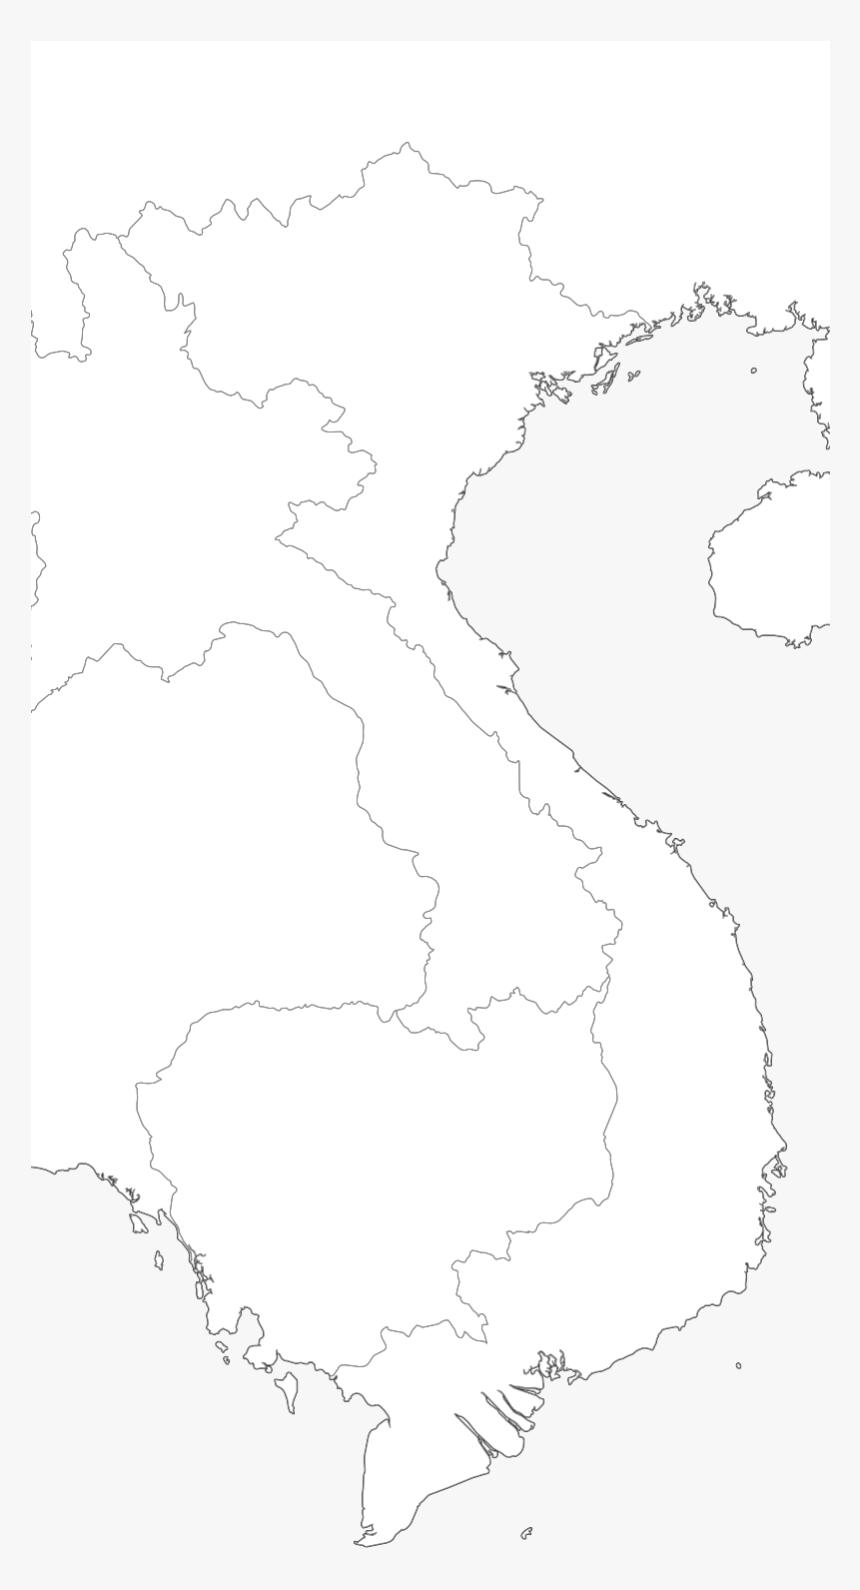 Transparent Vietnam Map Png - Blank Map Of Thailand Vietnam, Png Download, Free Download